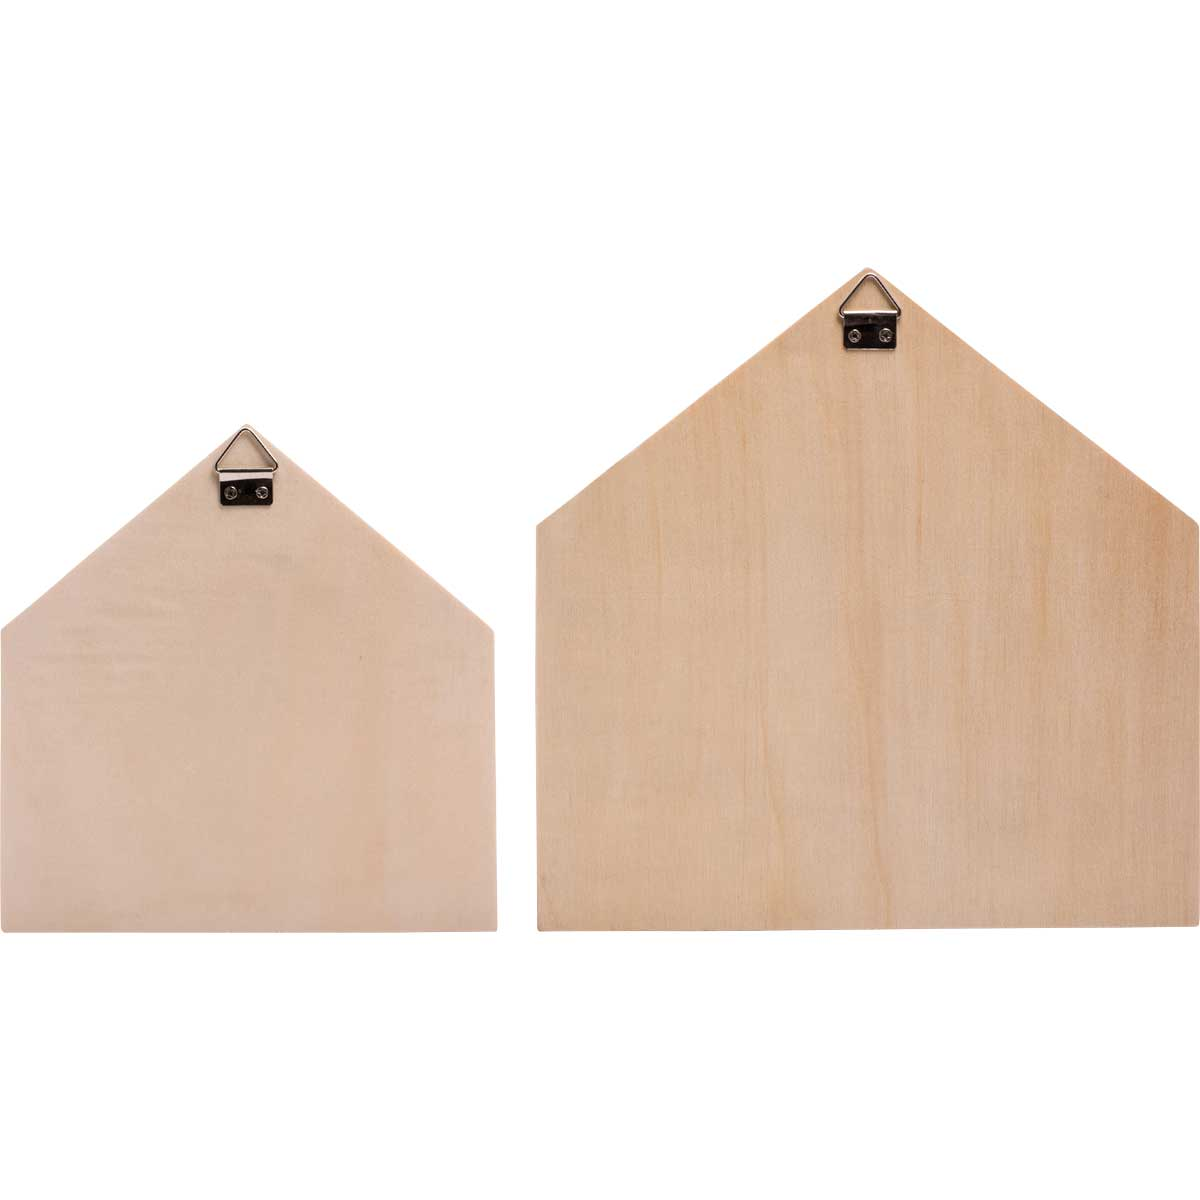 Plaid ® Wood Surfaces - Shadowbox Houses, 2 pc.